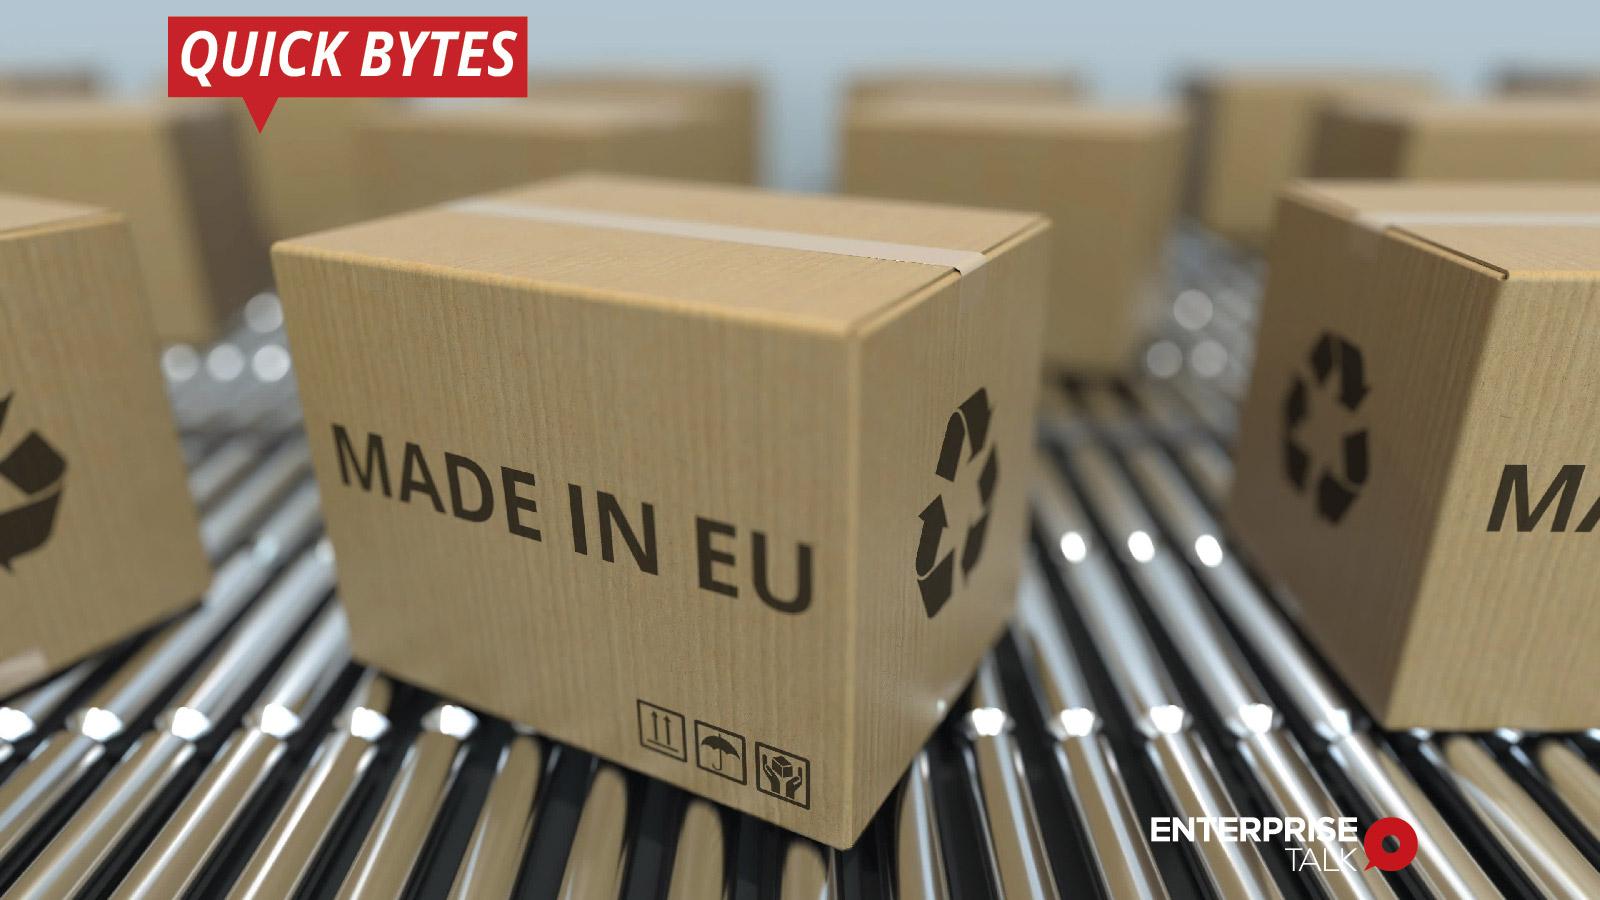 Global Trade, Tariffs, U.S, WTO, World Trade Organization, Airbus, Boeing, EU, Britain, France, Spain, Germany, Atlantic